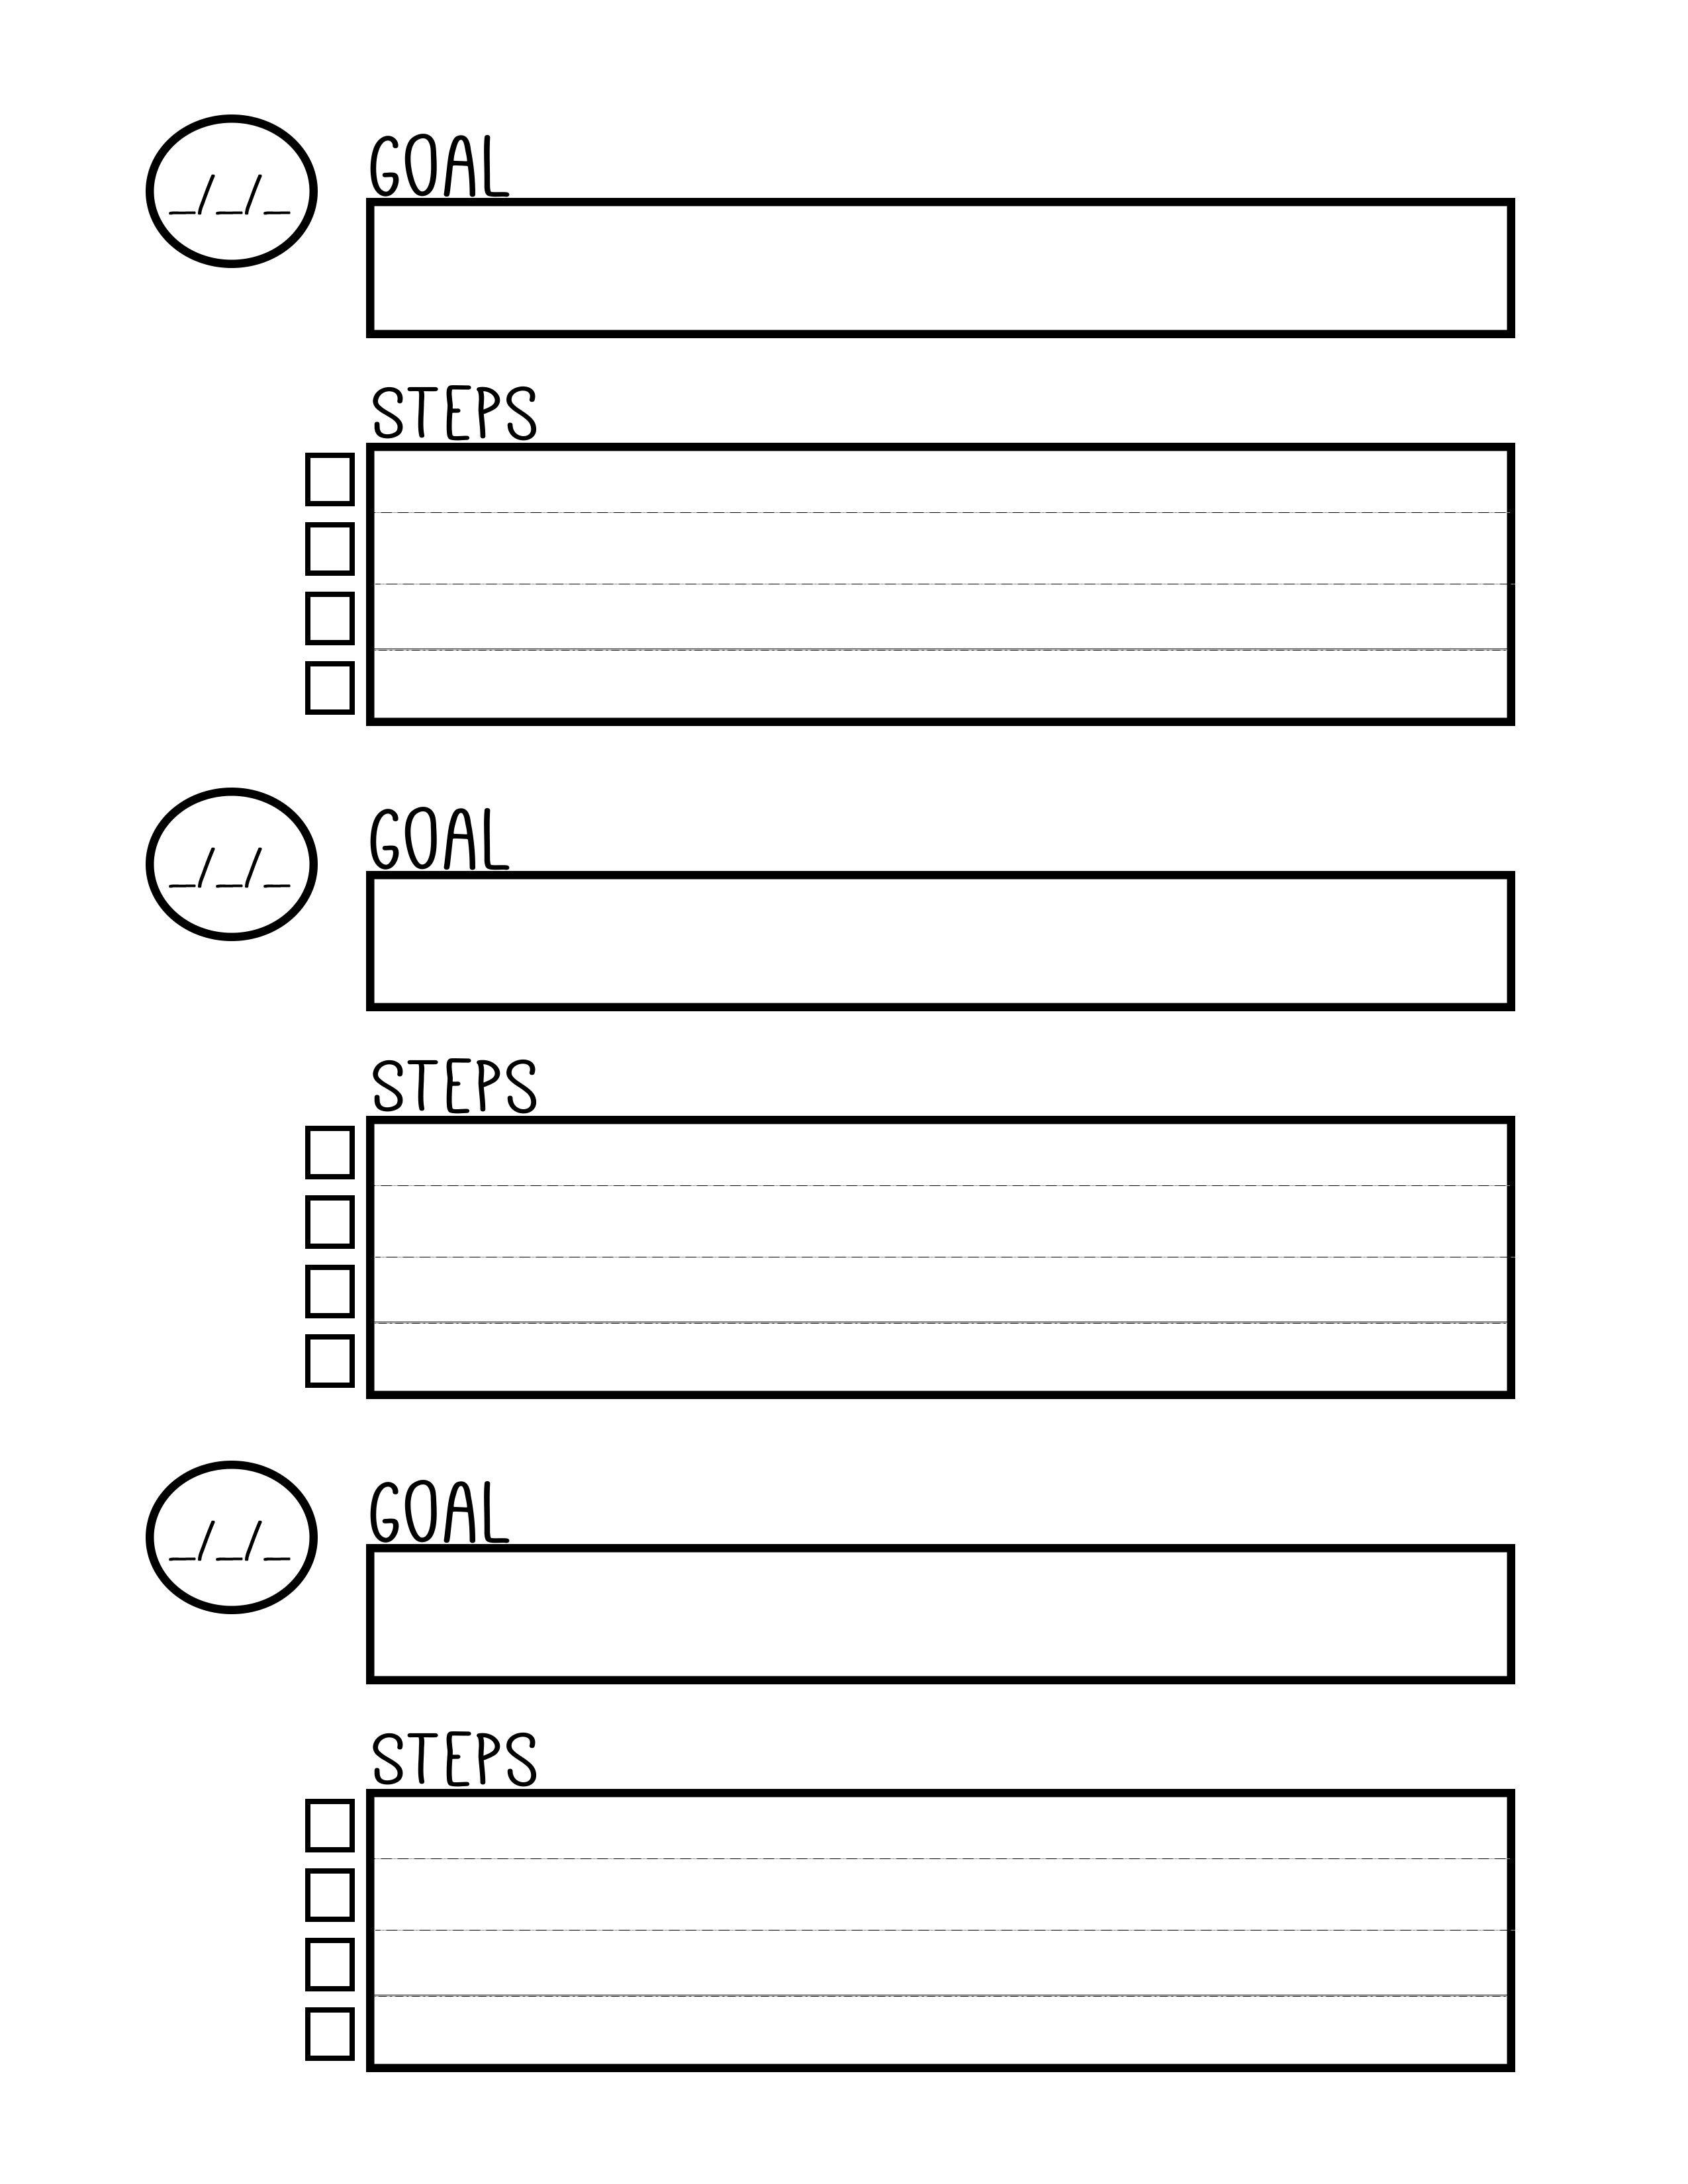 Free Printable Goal Setting Worksheet - Planner … | Education - Free Printable Goal Setting Worksheets For Students